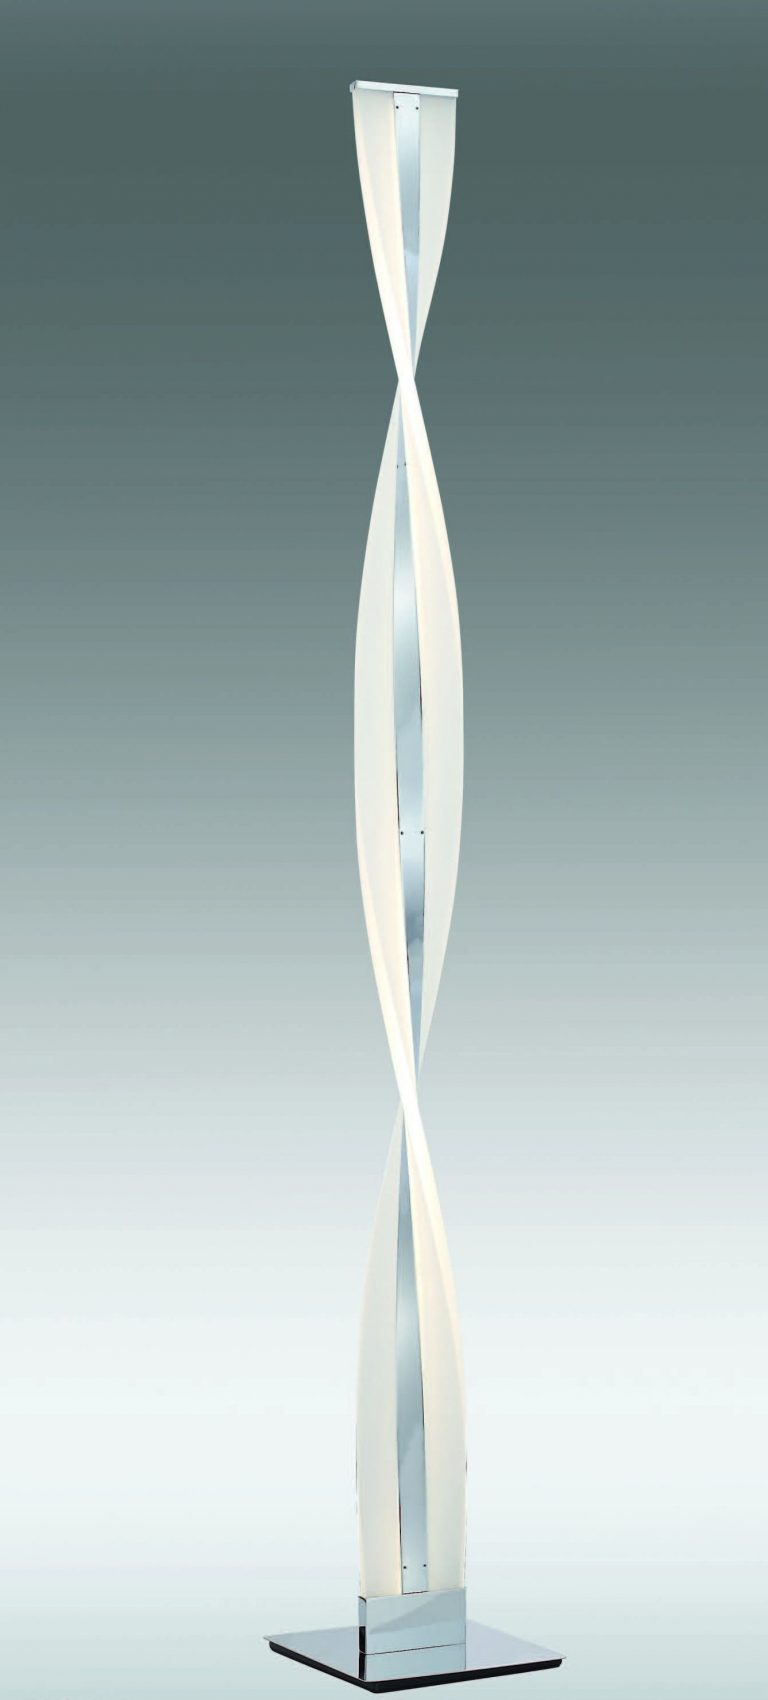 PIE TWIST CROMO 37W LED 4000K DIMMER MANDO RF